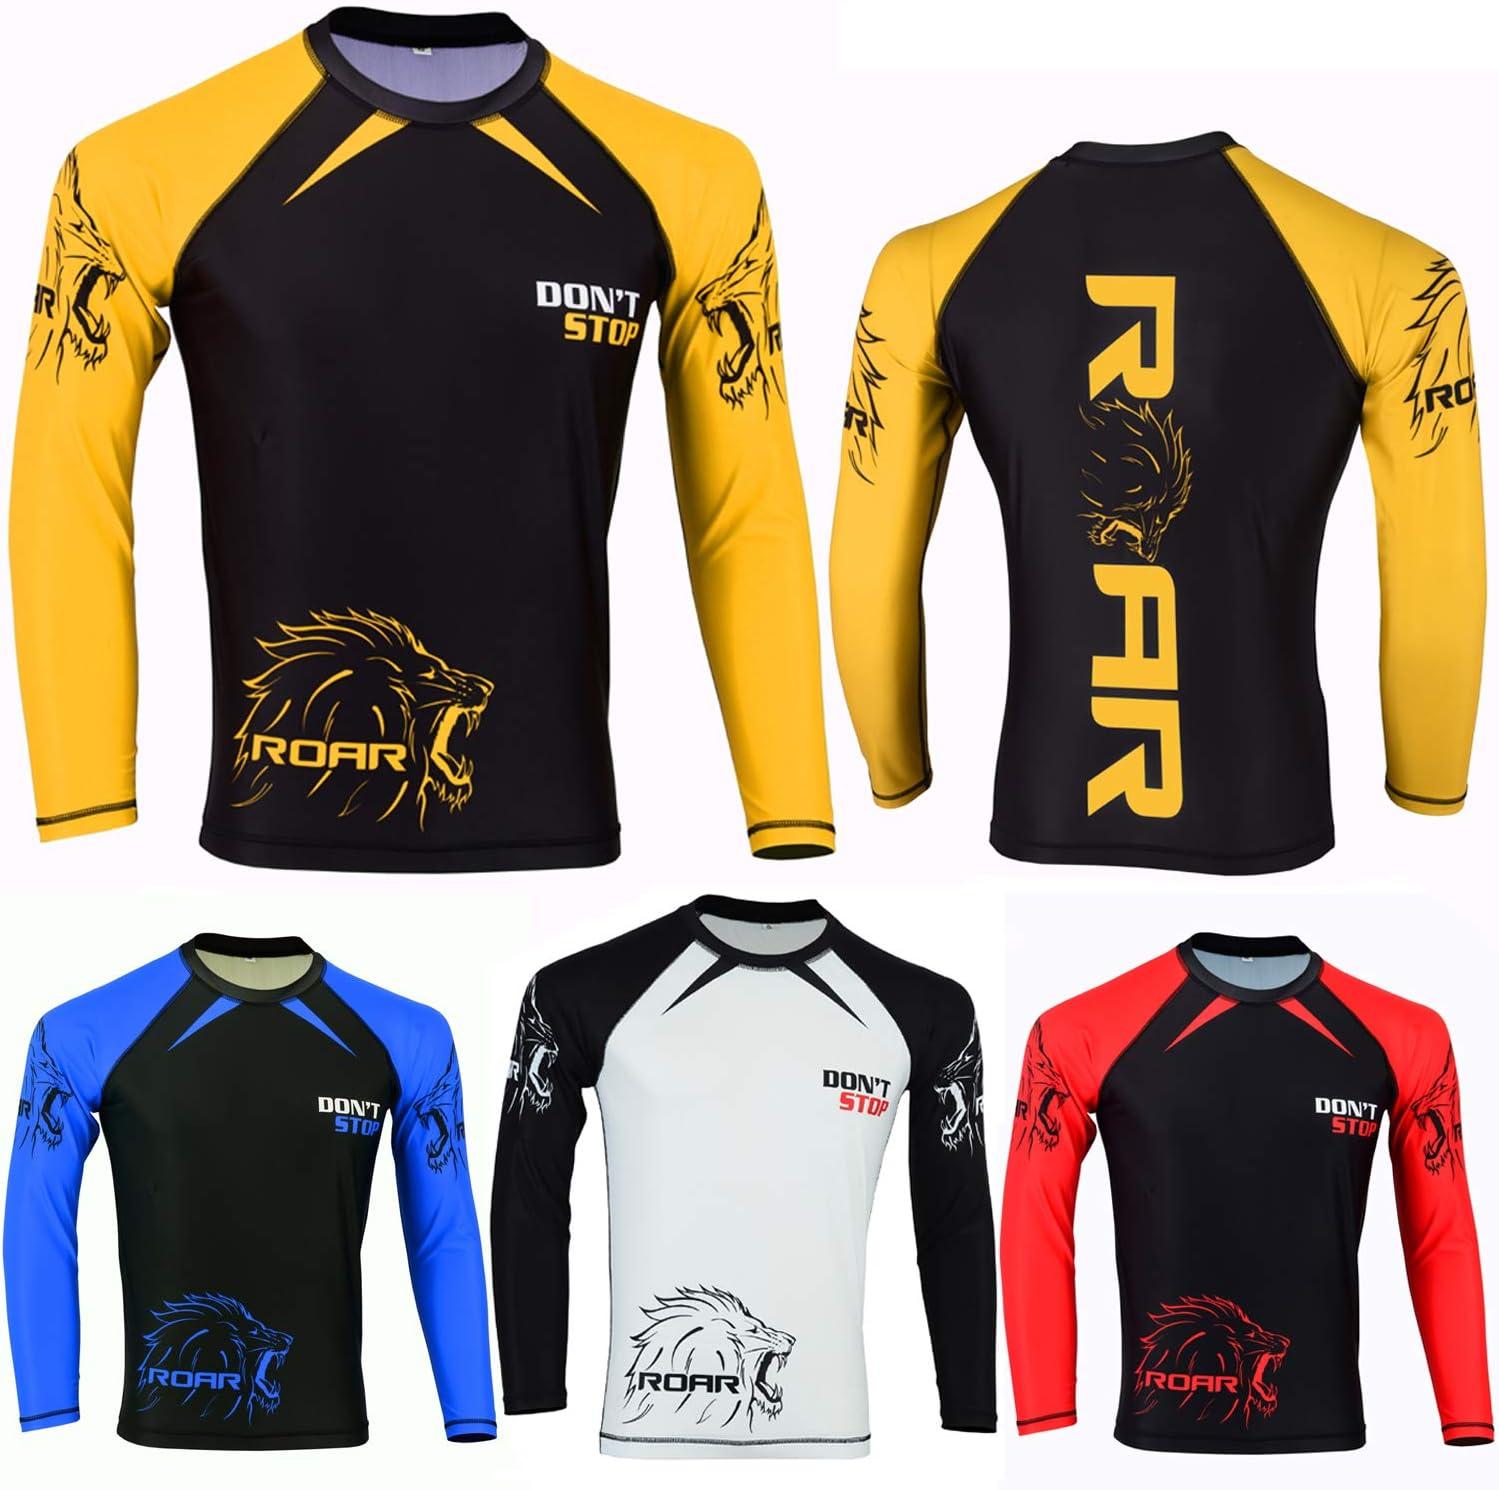 MMA Grappling Rash Guard UFC Boxing T-Shirt Sports Top Full//Long Sleeve S-M-L-XL